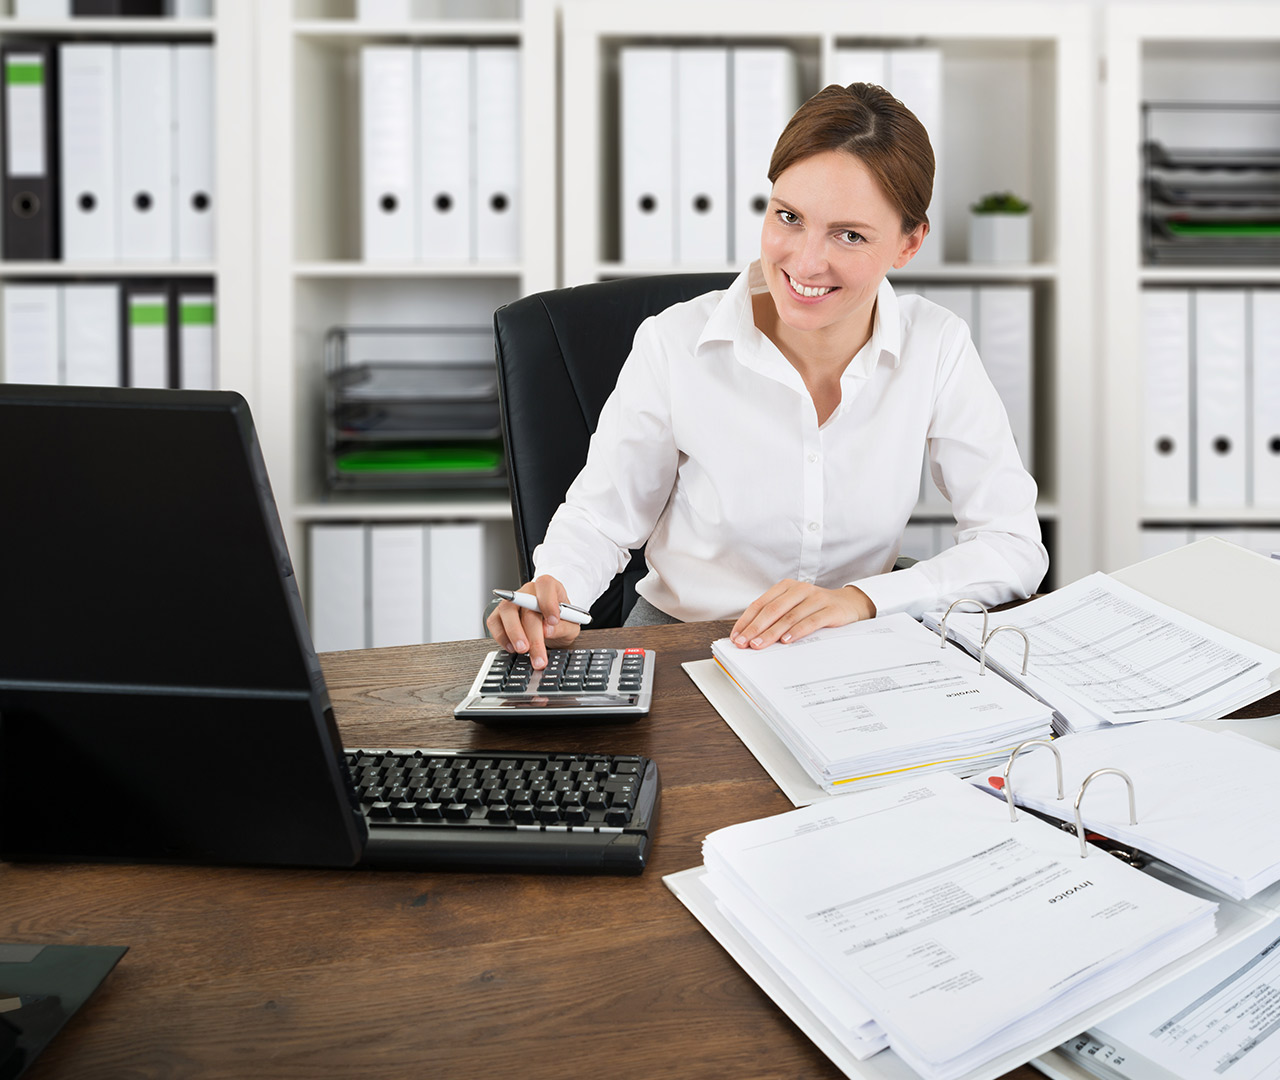 бухгалтер вакансии главный услуги